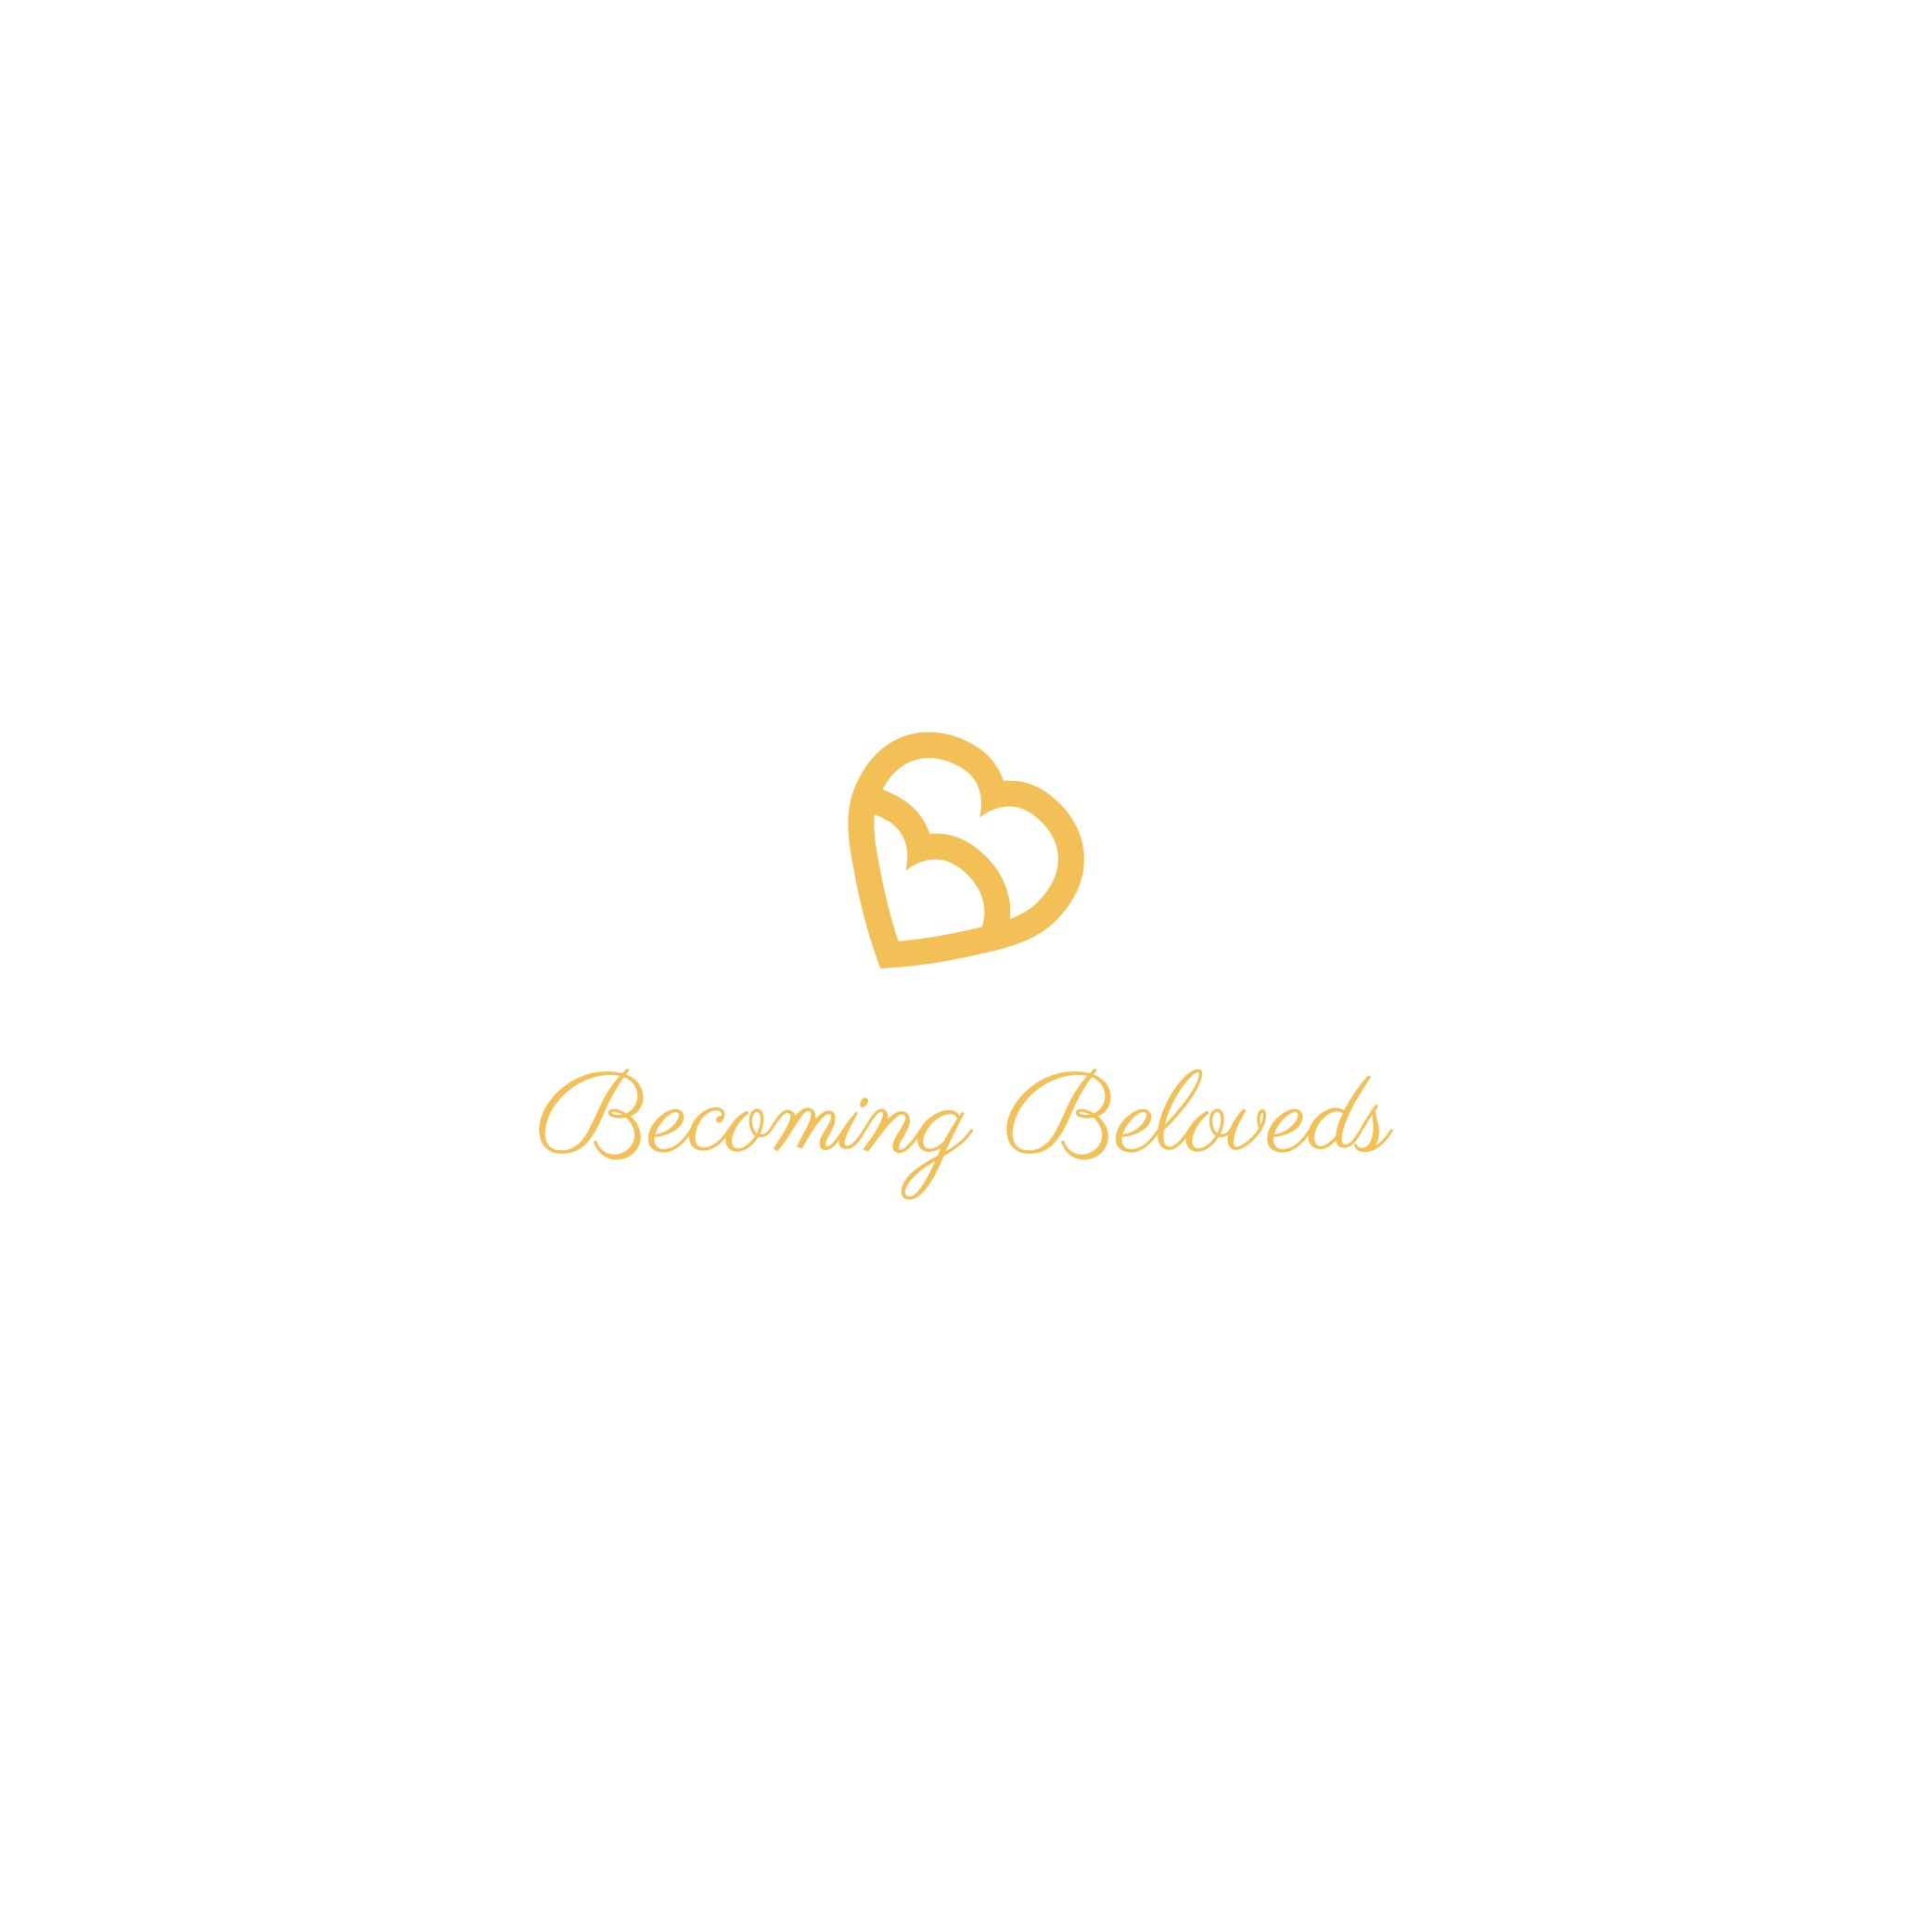 Becoming Beloveds Logo